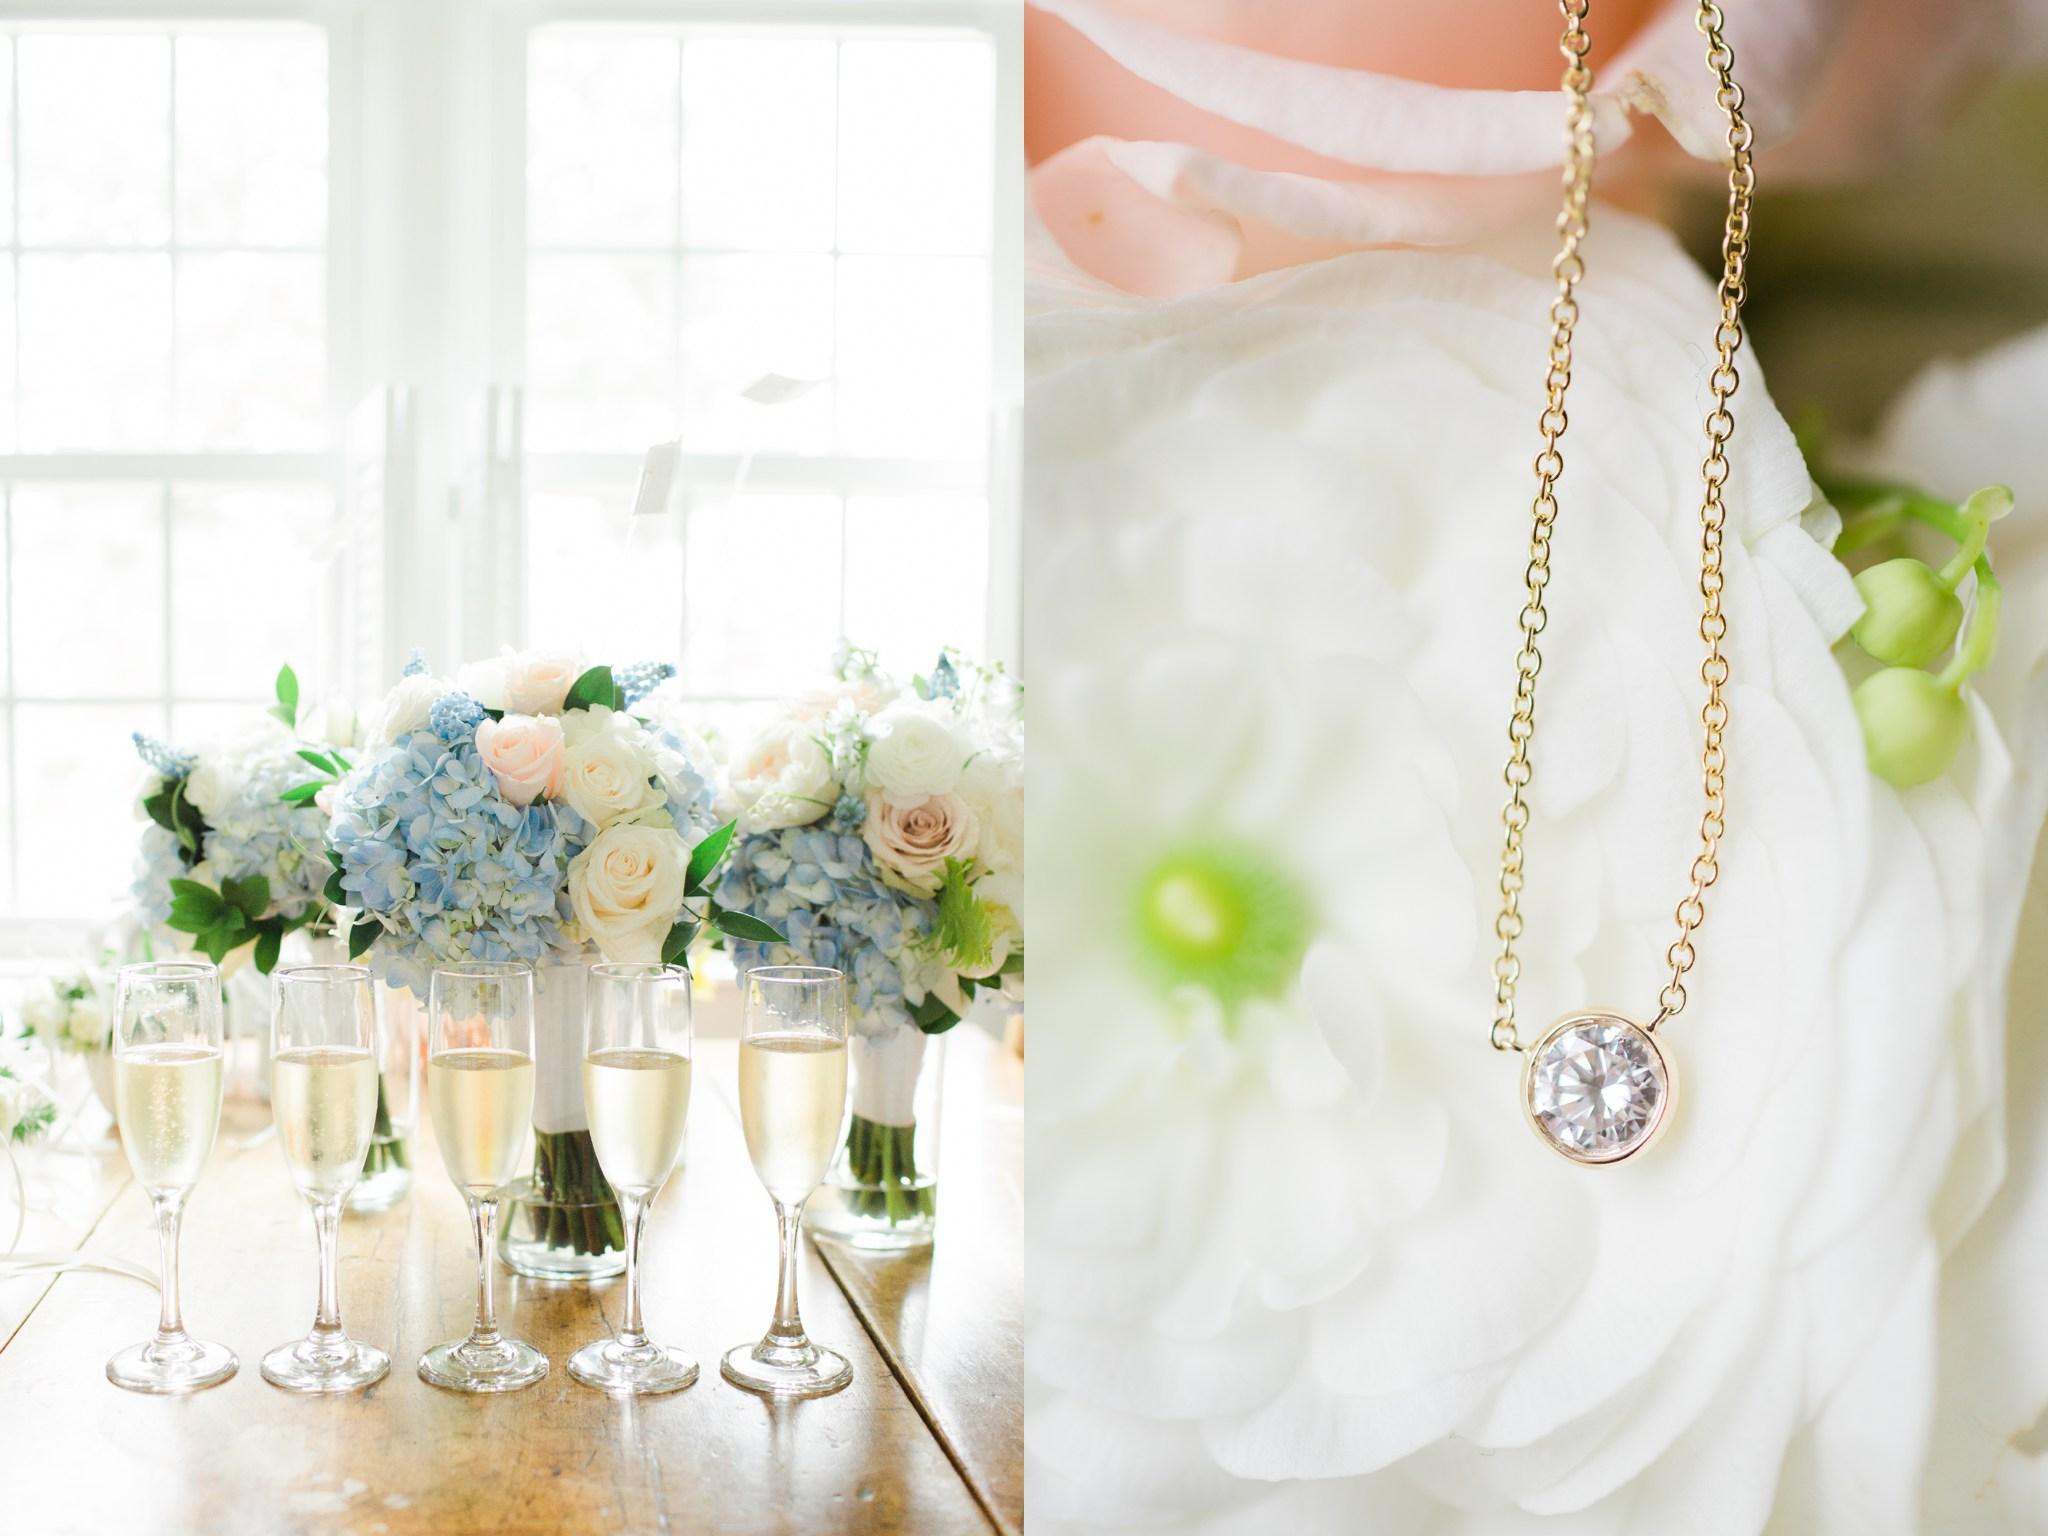 cape_cod_wedding_deborah_zoe_Photography_00014.JPG